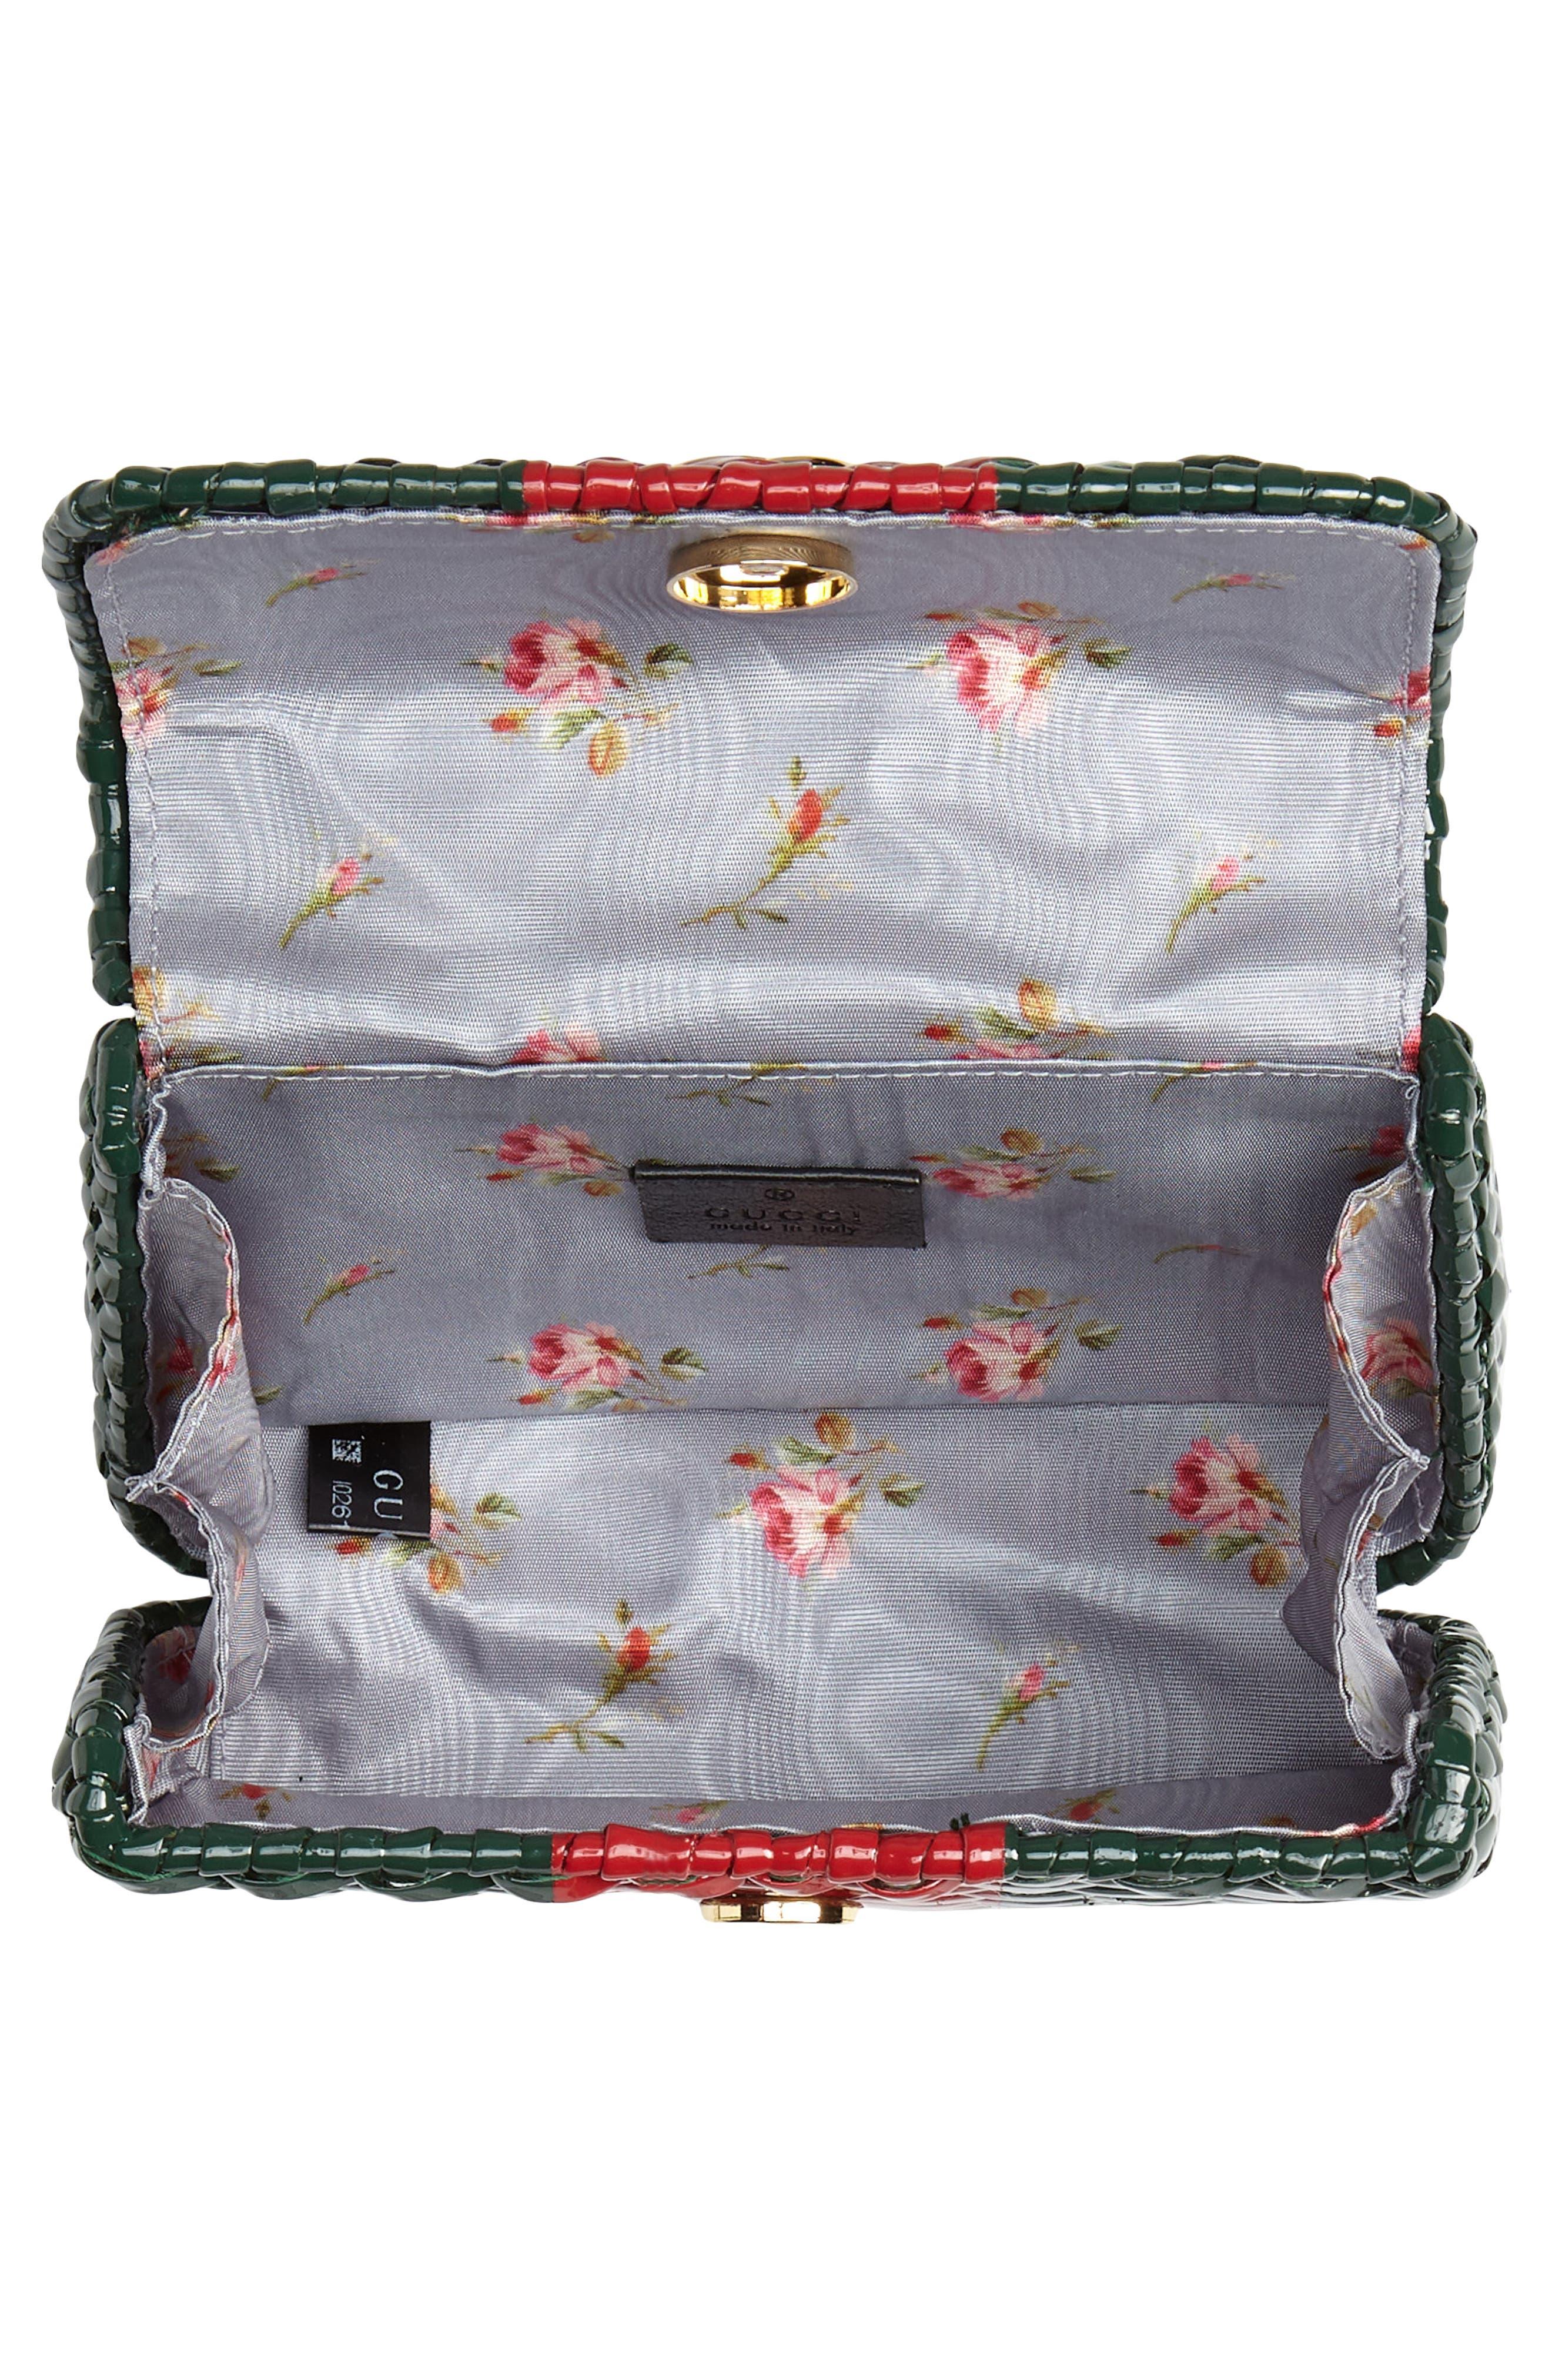 Small Linea Cestino Glazed Wicker Shoulder Bag,                             Alternate thumbnail 4, color,                             VERDE ROSSO VERDE